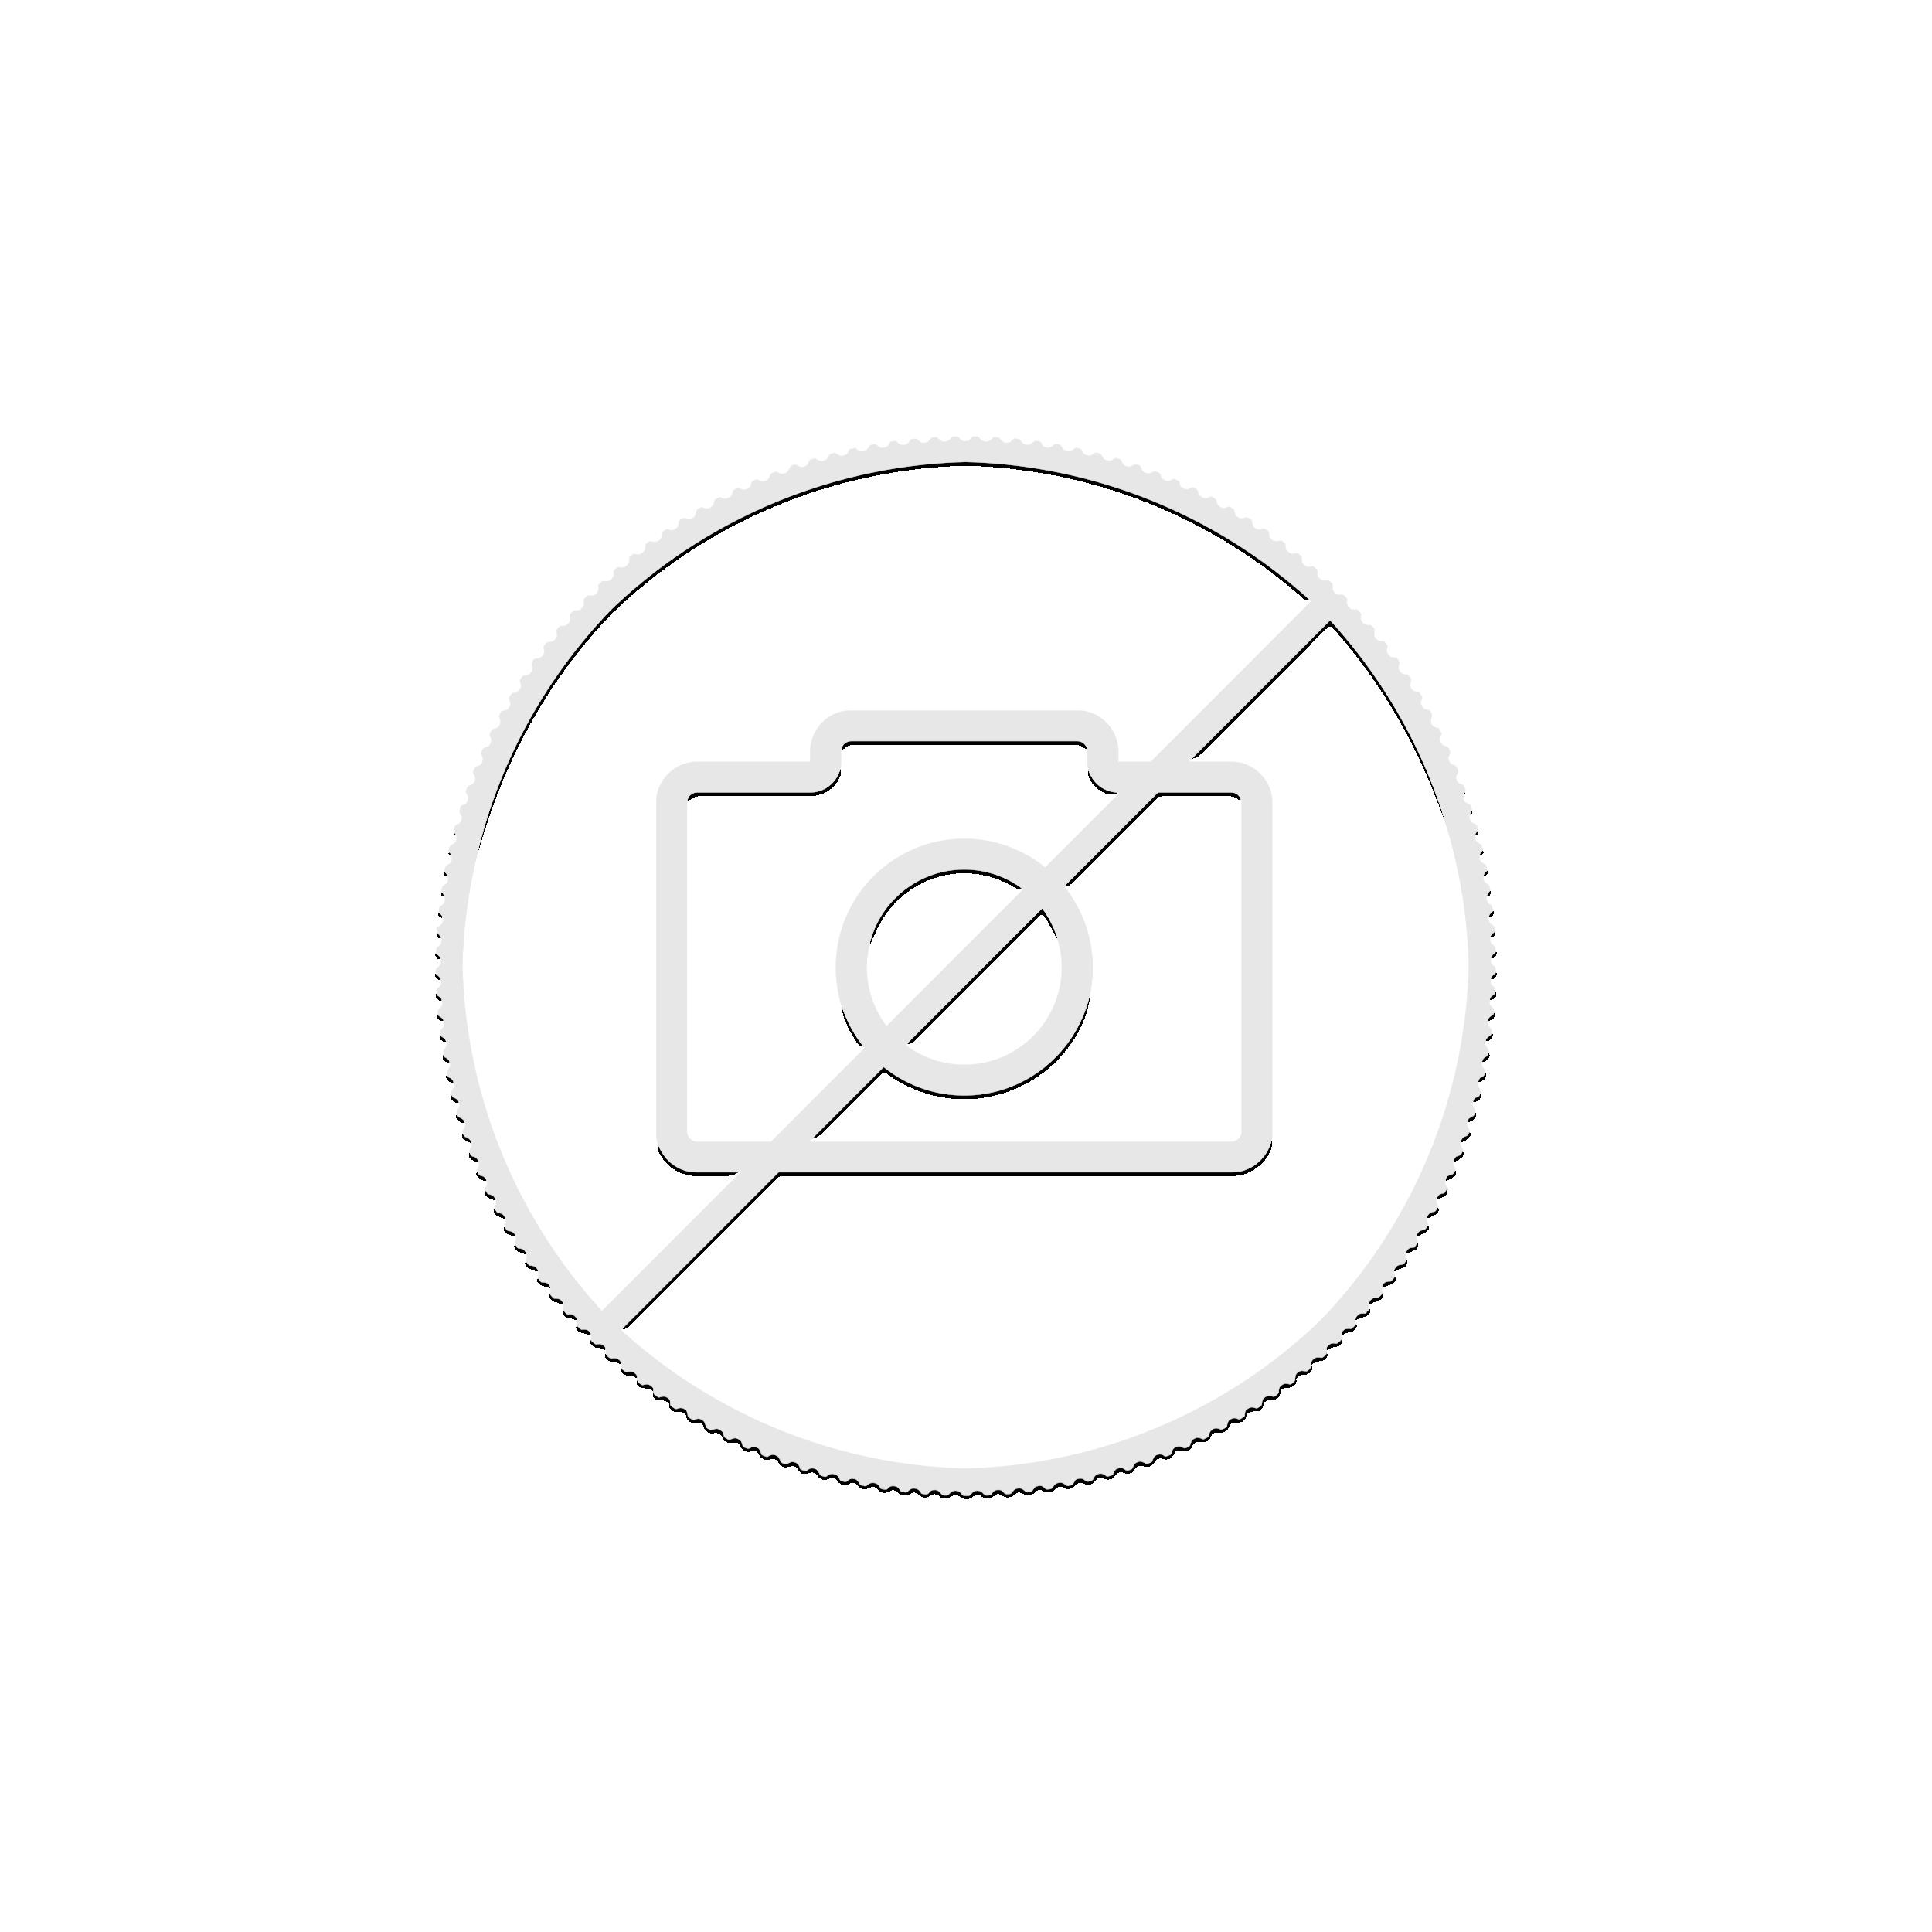 1 troy ounce zilveren munt Diwali 2021 - achterkant